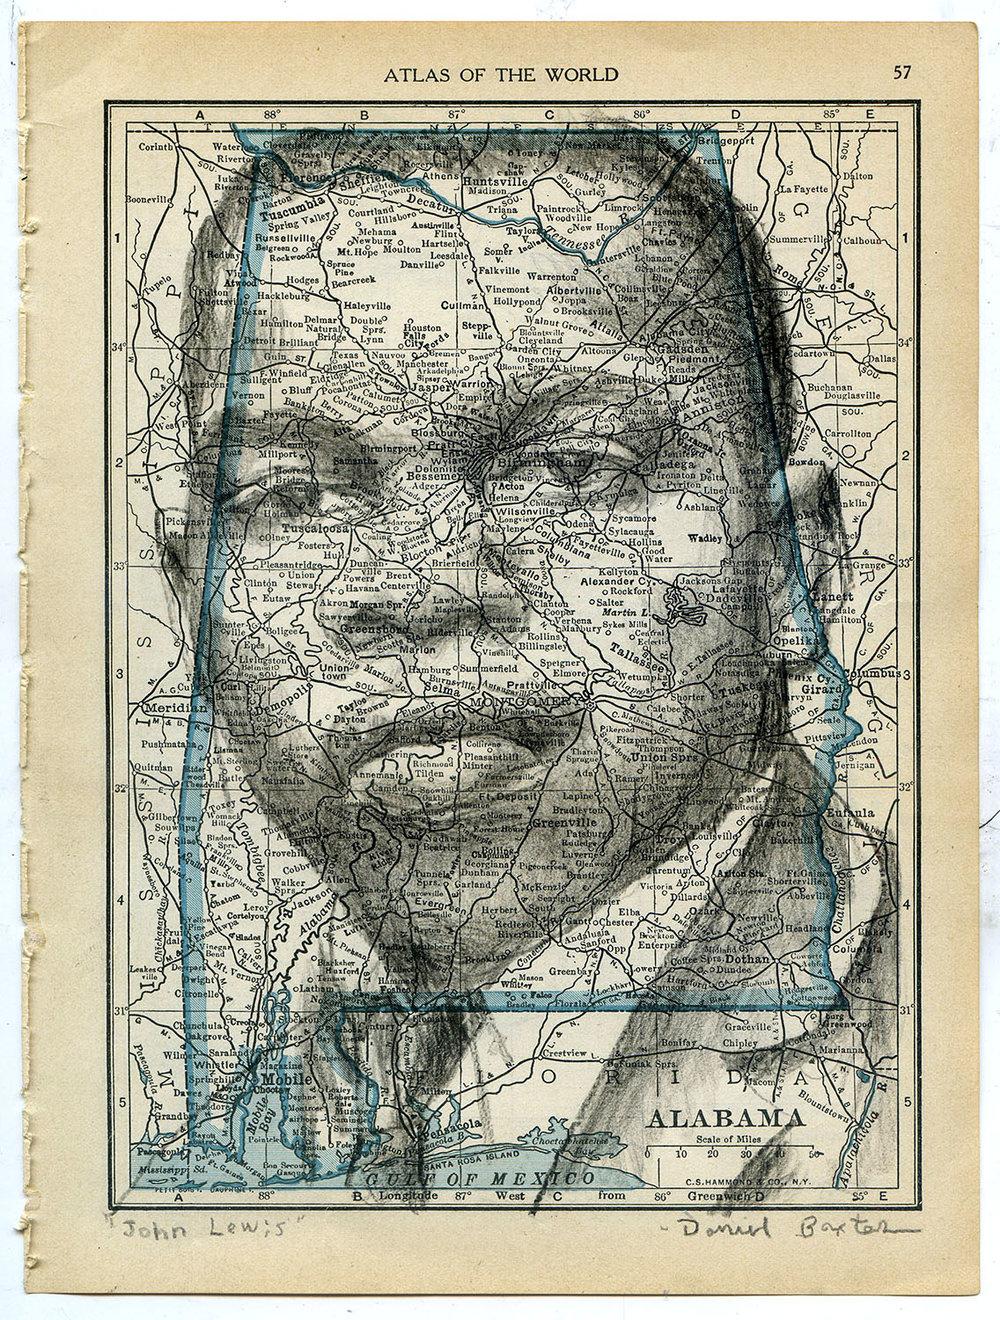 Daniel Baxter John Lewis portrait.jpg